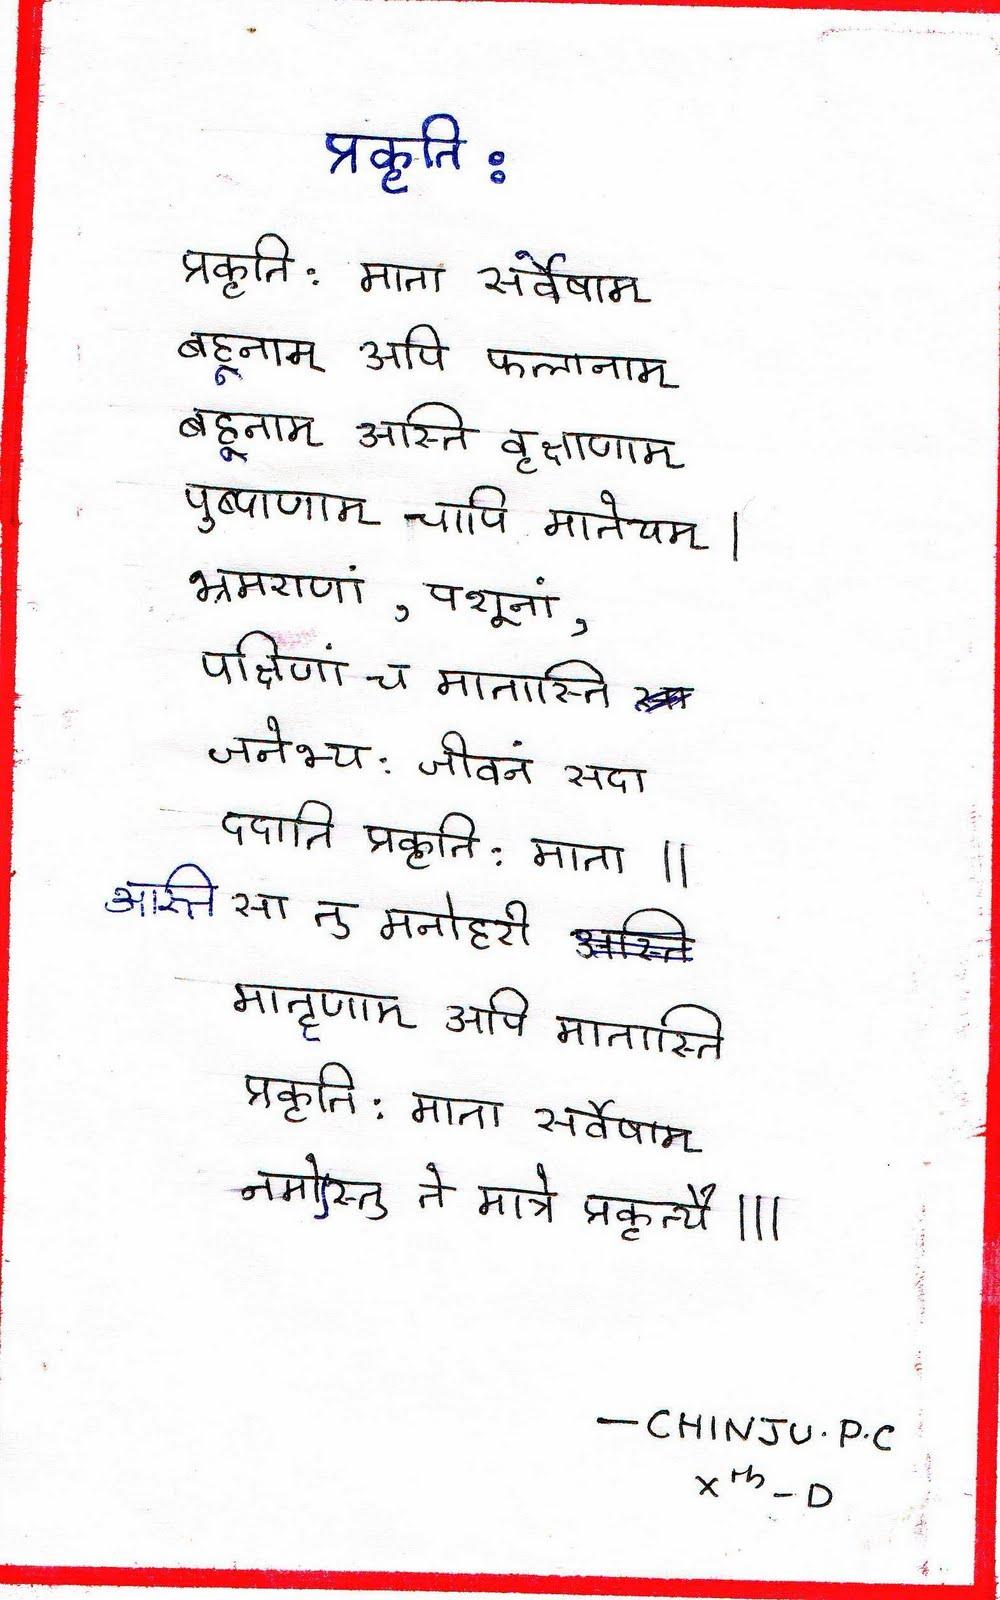 poems on corruption in hindi 17 मई 2015  best hindi kavita on corruption - poem by prabhakar yadav शीश कटाते  फौजी देखे, आँख दिखाता पाकिस्तान, भाव गिराता.